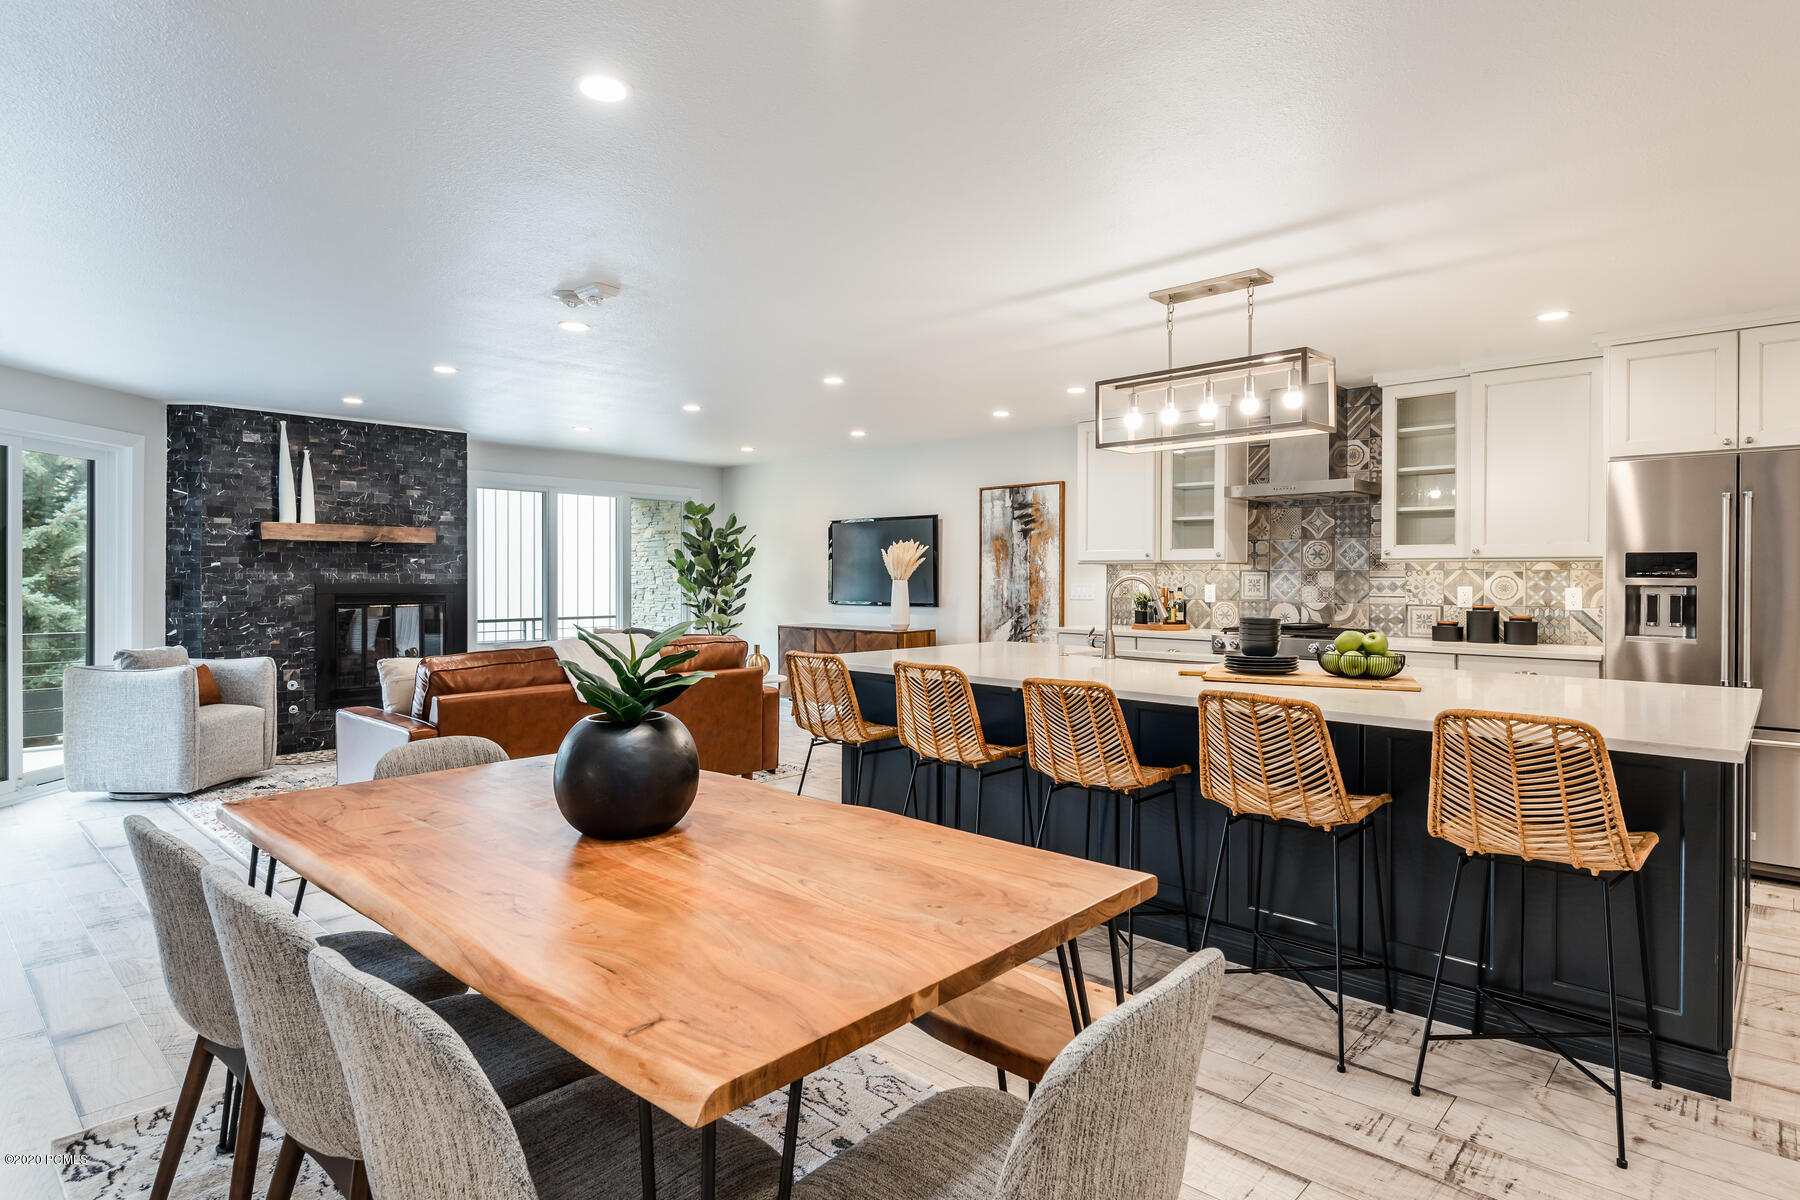 720 Saddle View Way, Park City, Utah 84060, 4 Bedrooms Bedrooms, ,4 BathroomsBathrooms,Condominium,For Sale,Saddle View,12002863